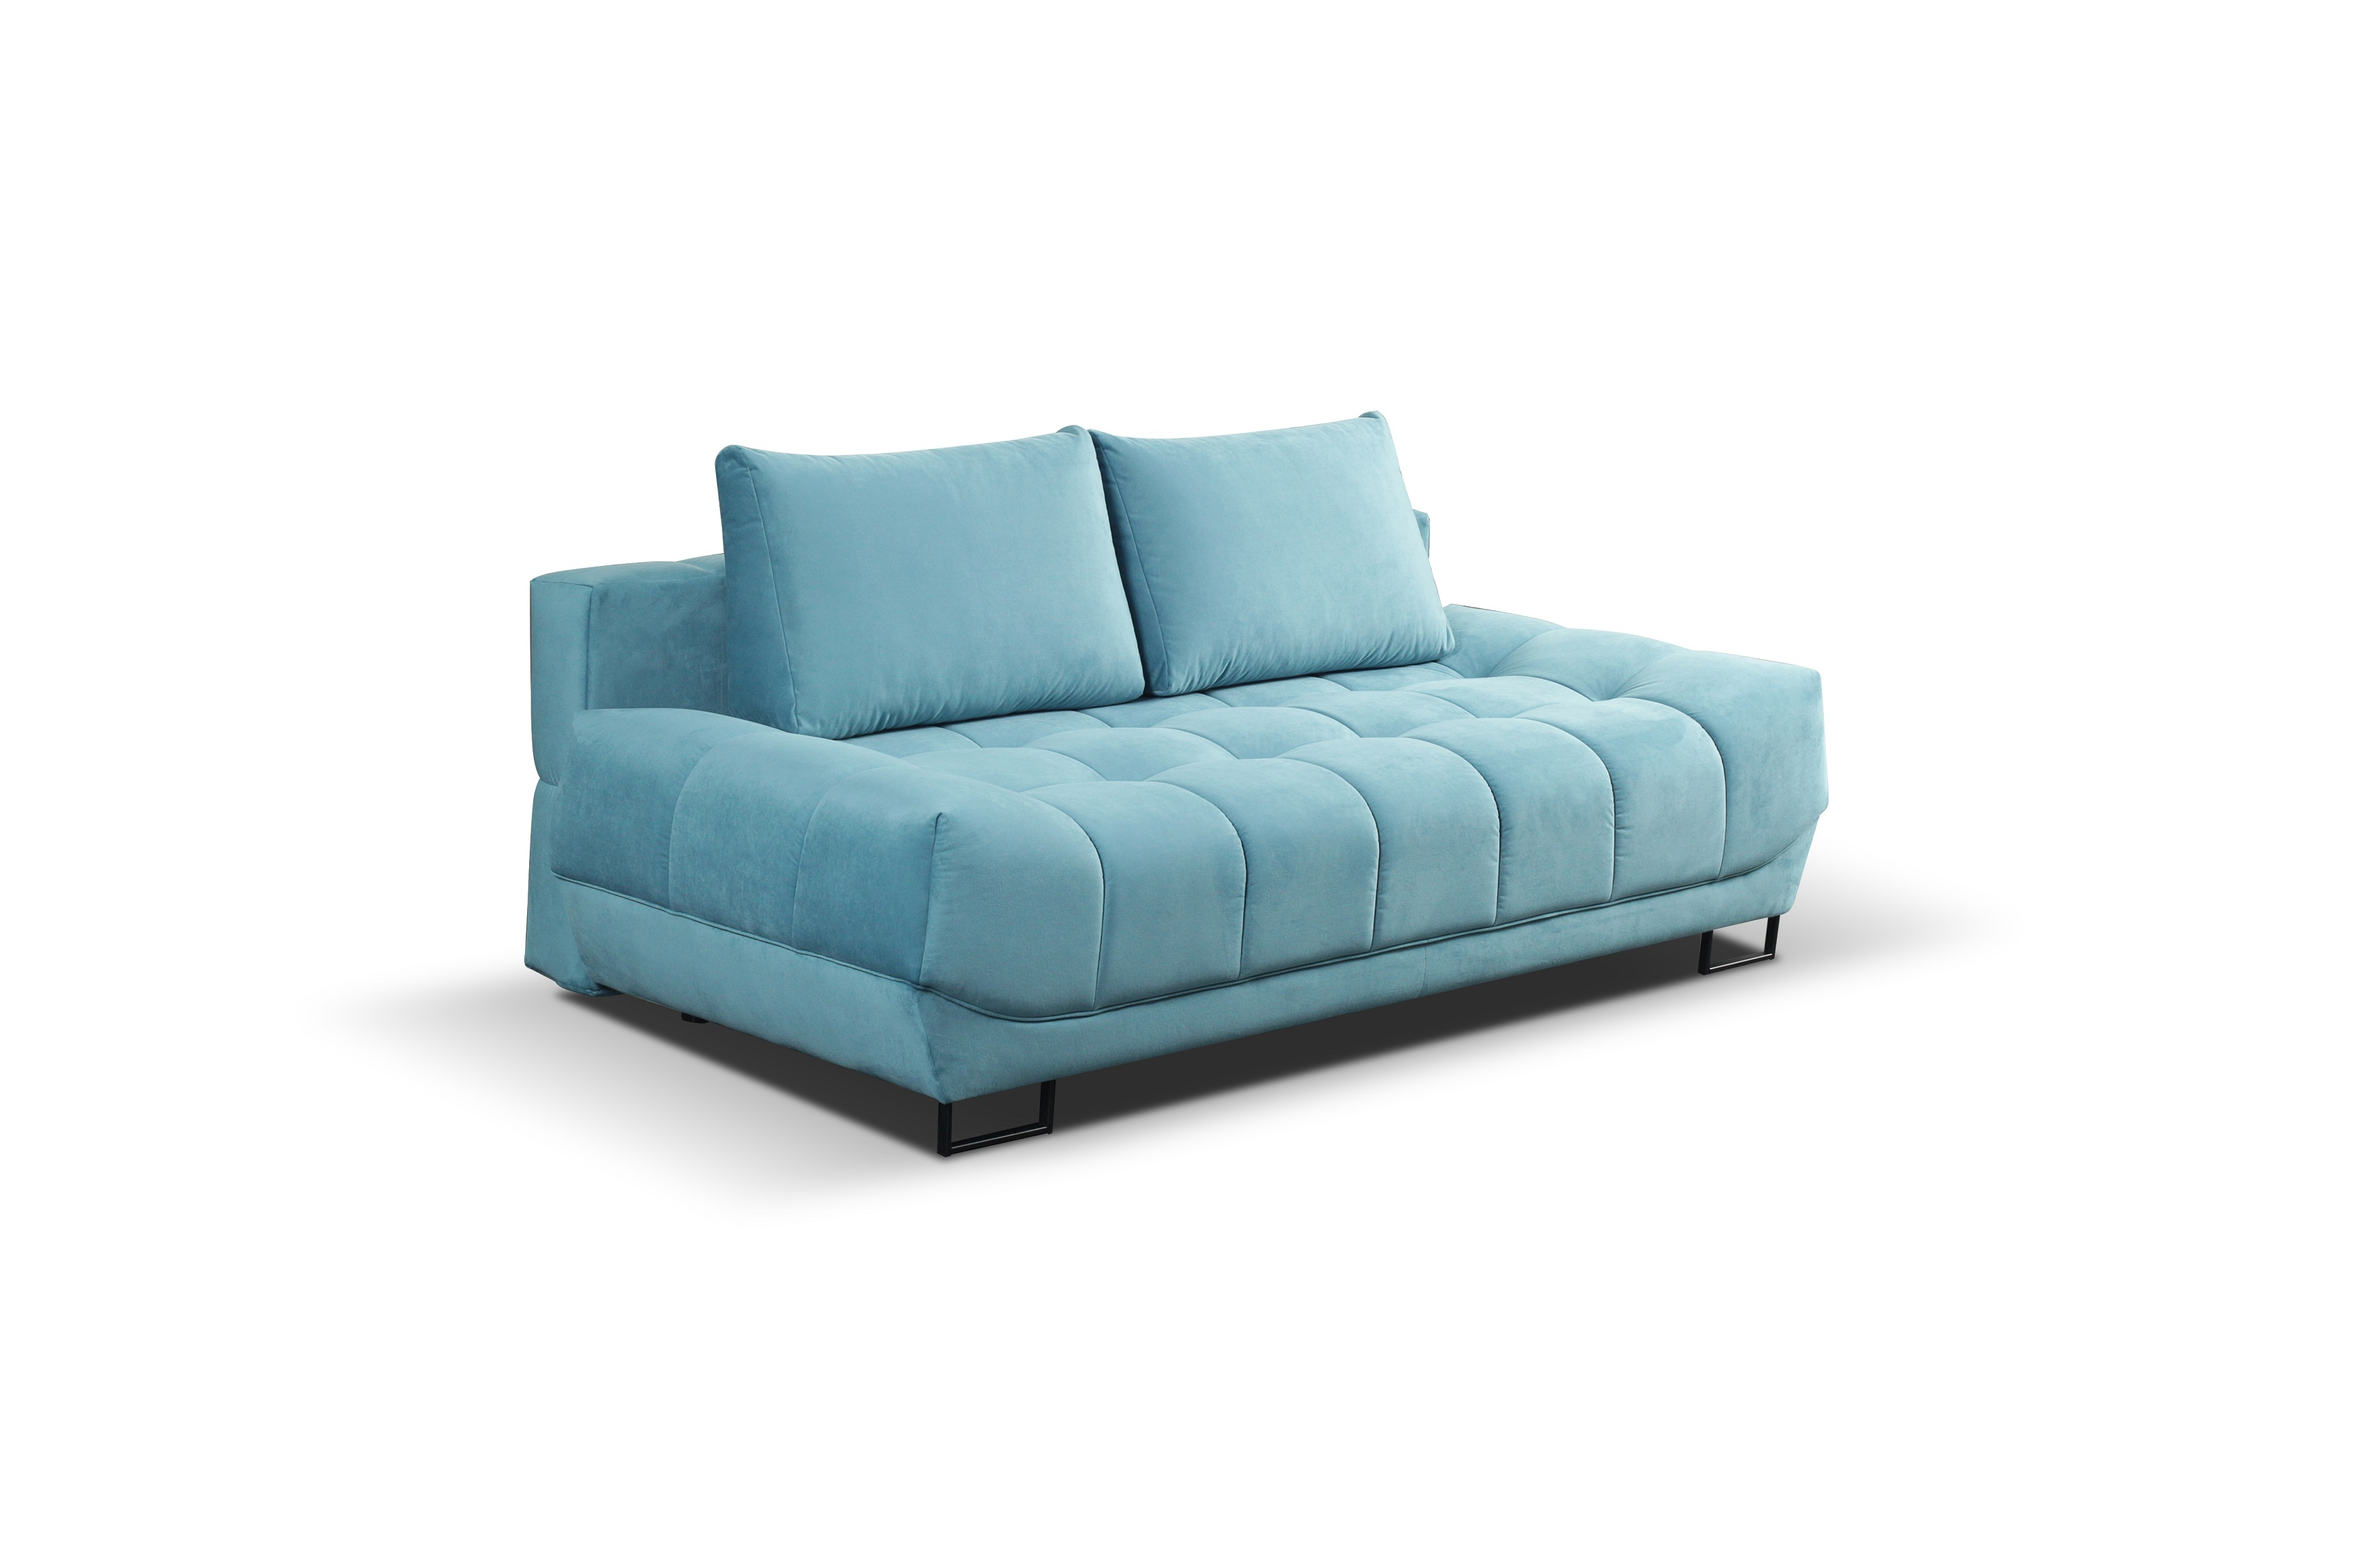 Canapea extensibila cu lada de depozitare, 3 locuri Venice, l218xA112xH71 cm